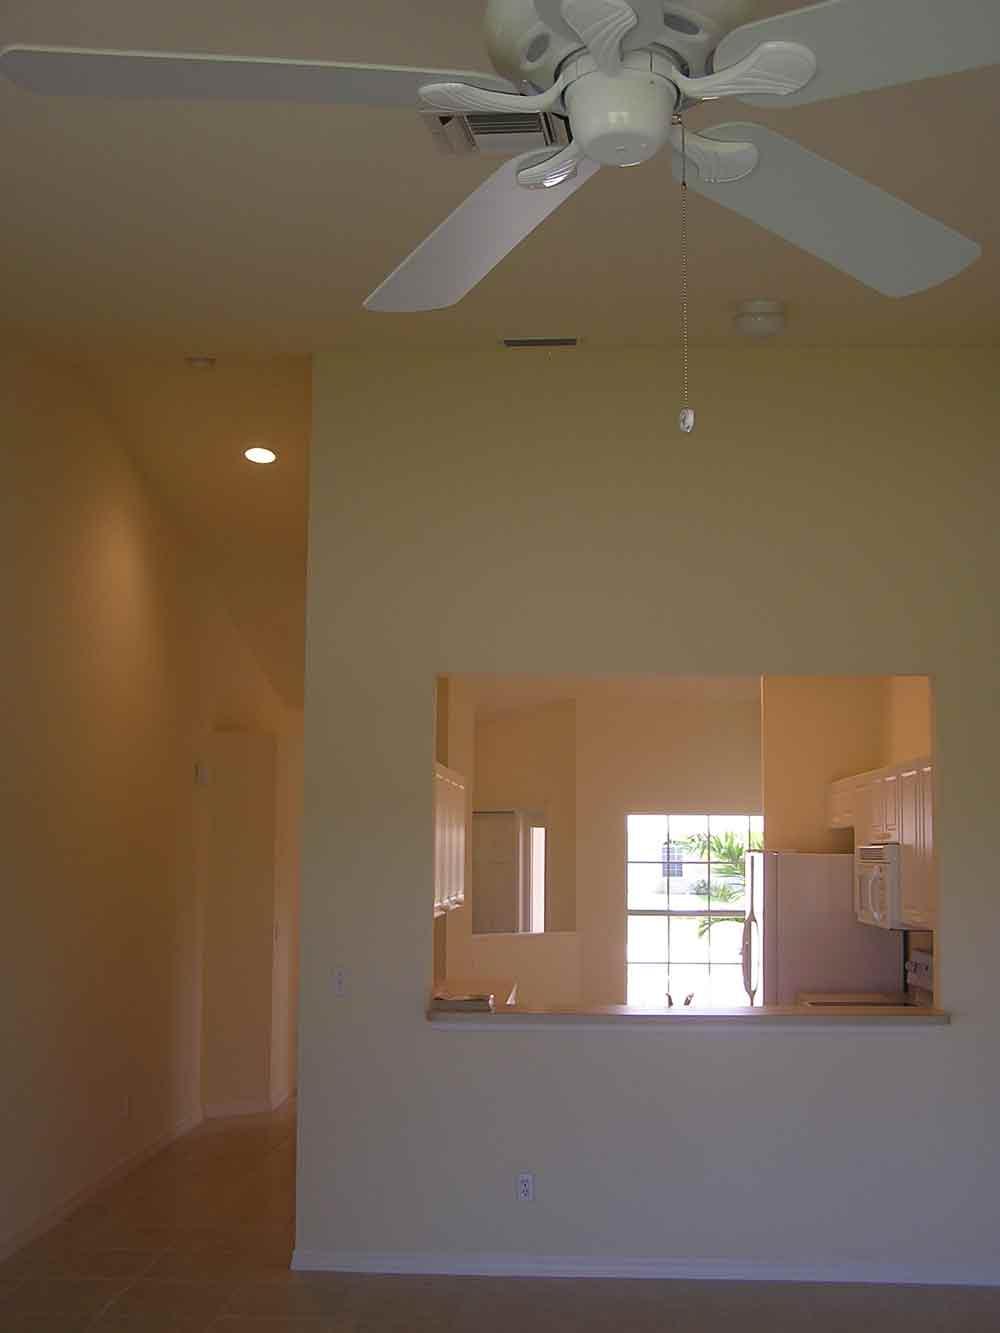 kitchen appliance sales delta single handle faucet repair southwest florida custom home builder; worthington homes